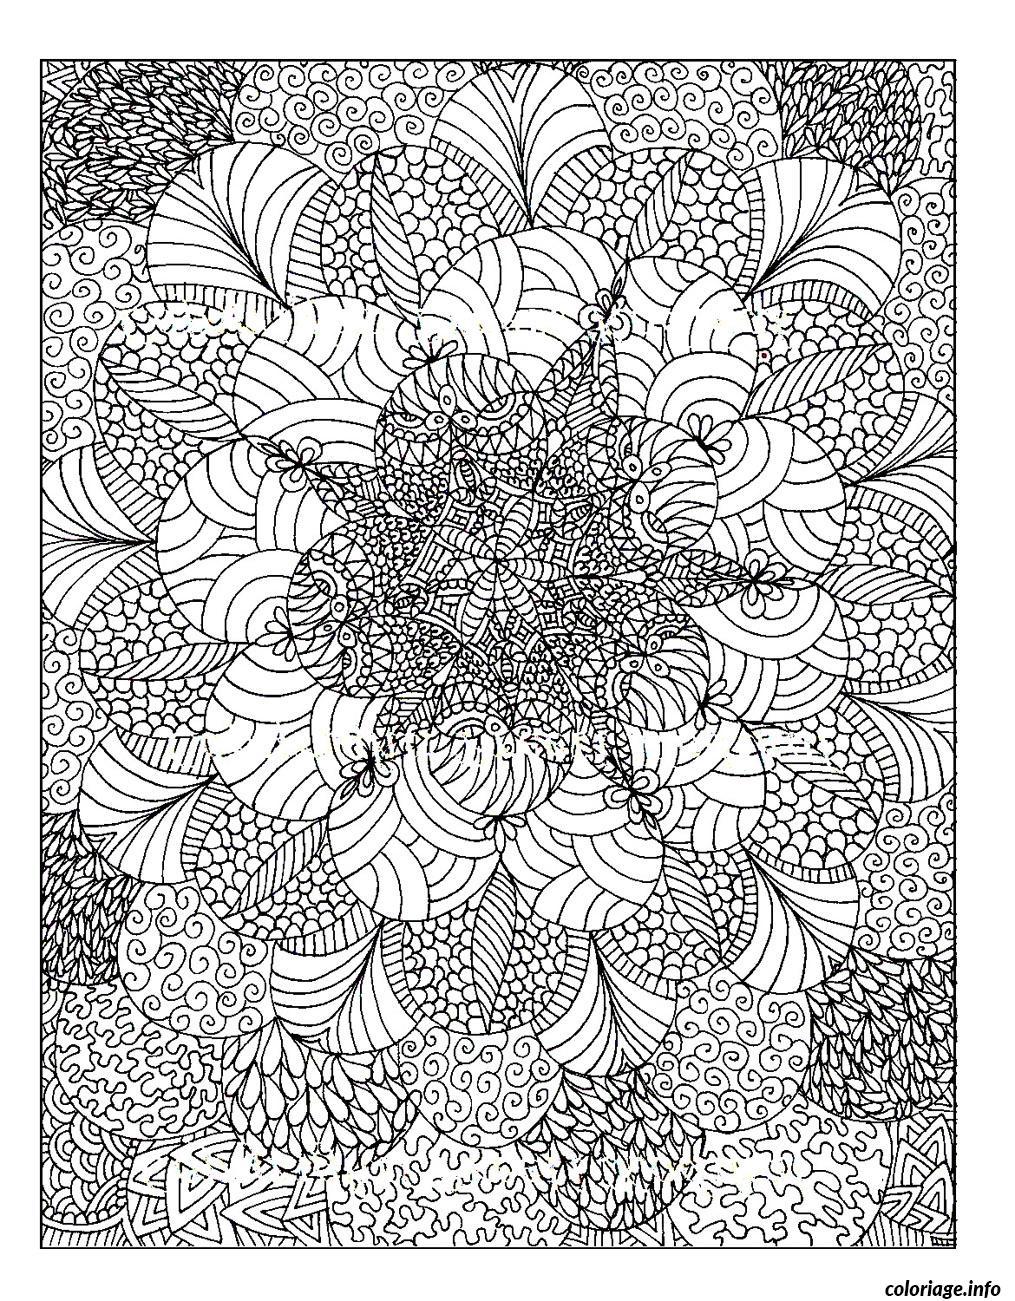 Dessin adulte dessin 146 Coloriage Gratuit à Imprimer